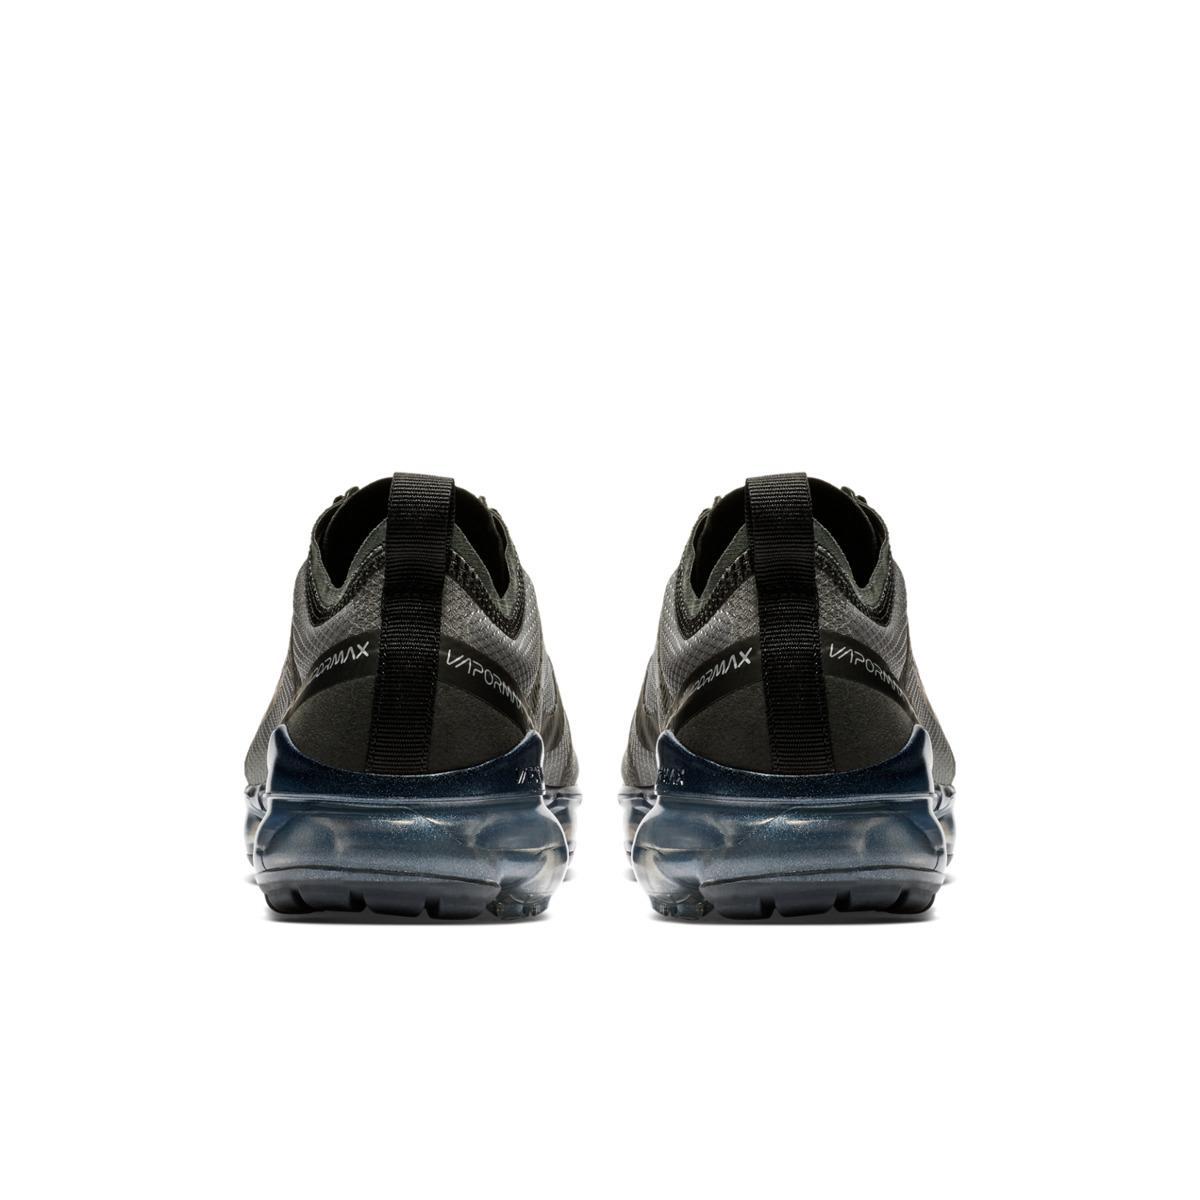 94cde243e81 Nike - Black Air Vapormax Flyknit 2019 Casual Trainers - Lyst. View  fullscreen